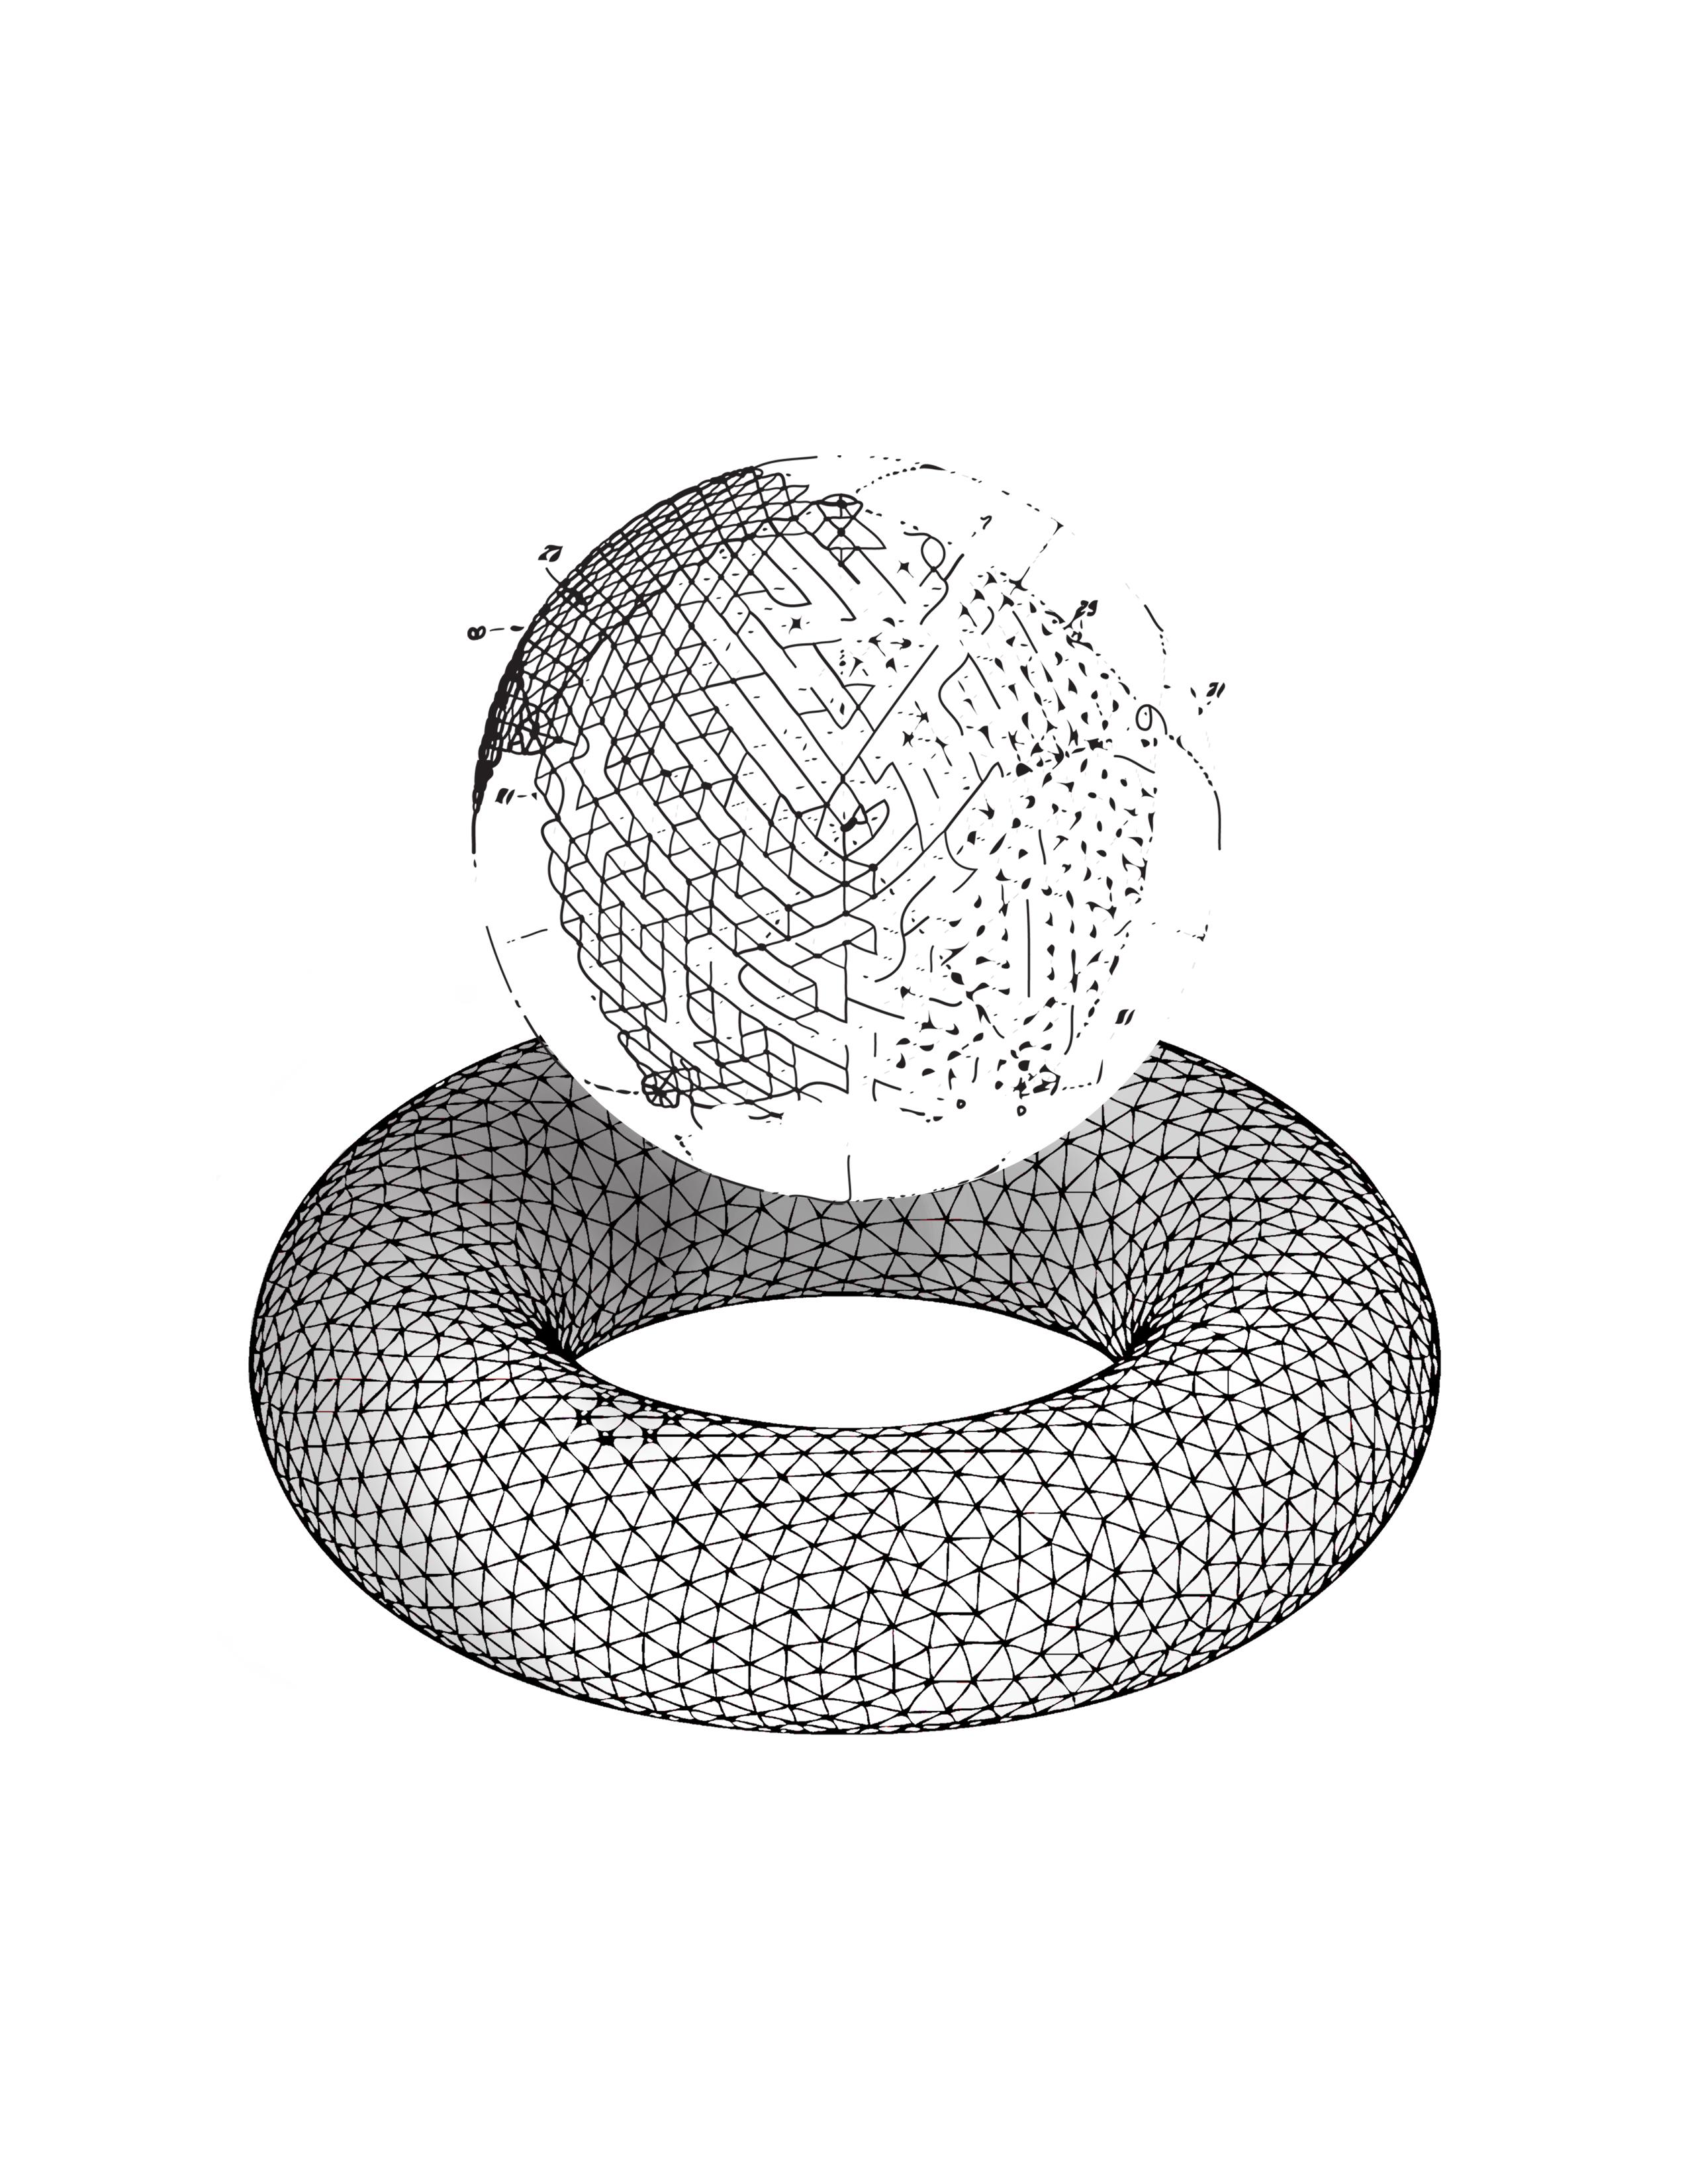 Torus and Sphere